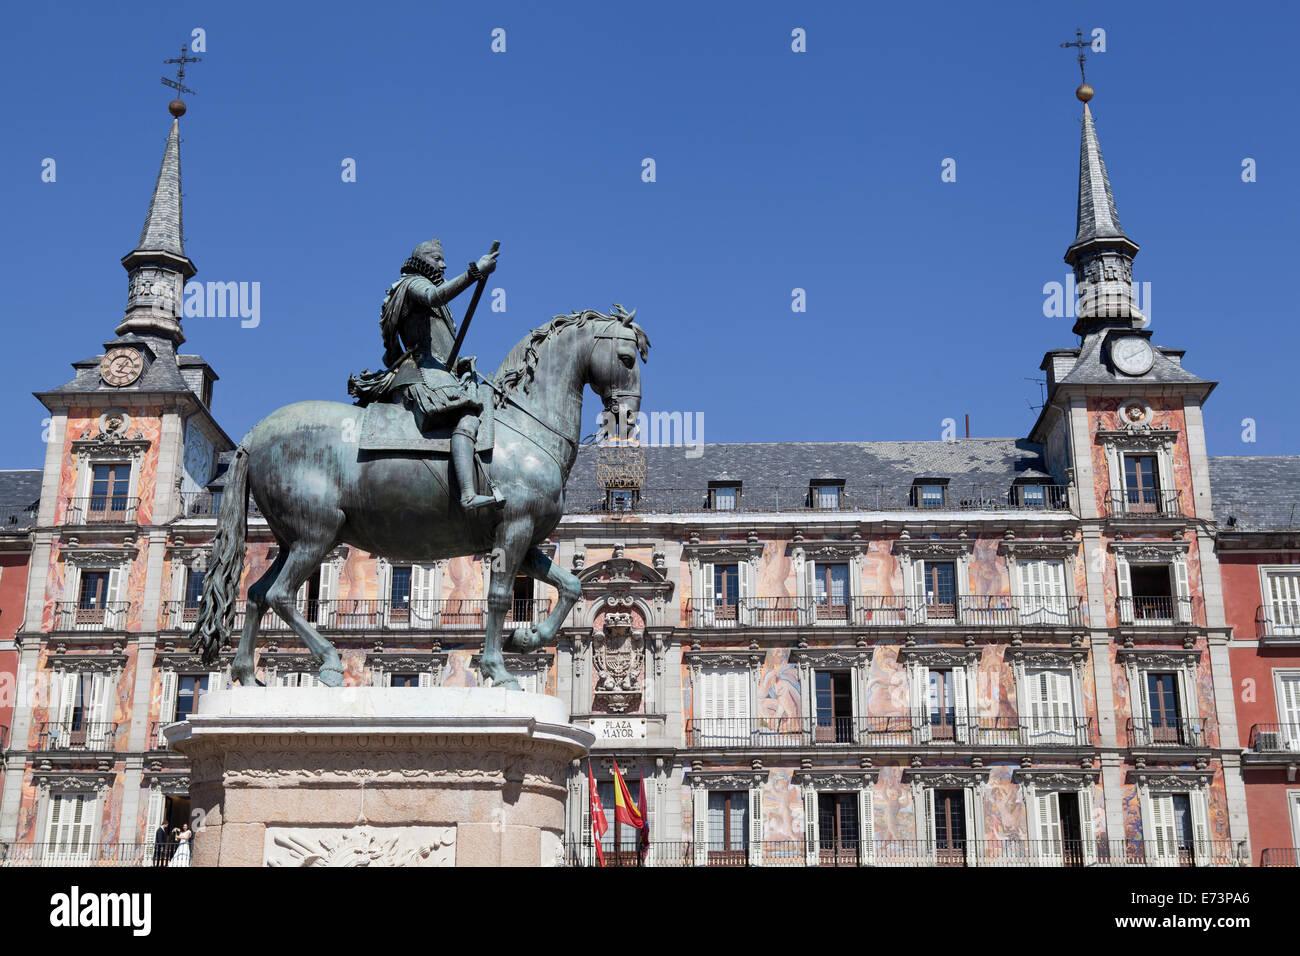 Spain, Madrid, Statue of King Philip III on horseback  Plaza Mayor. Stock Photo